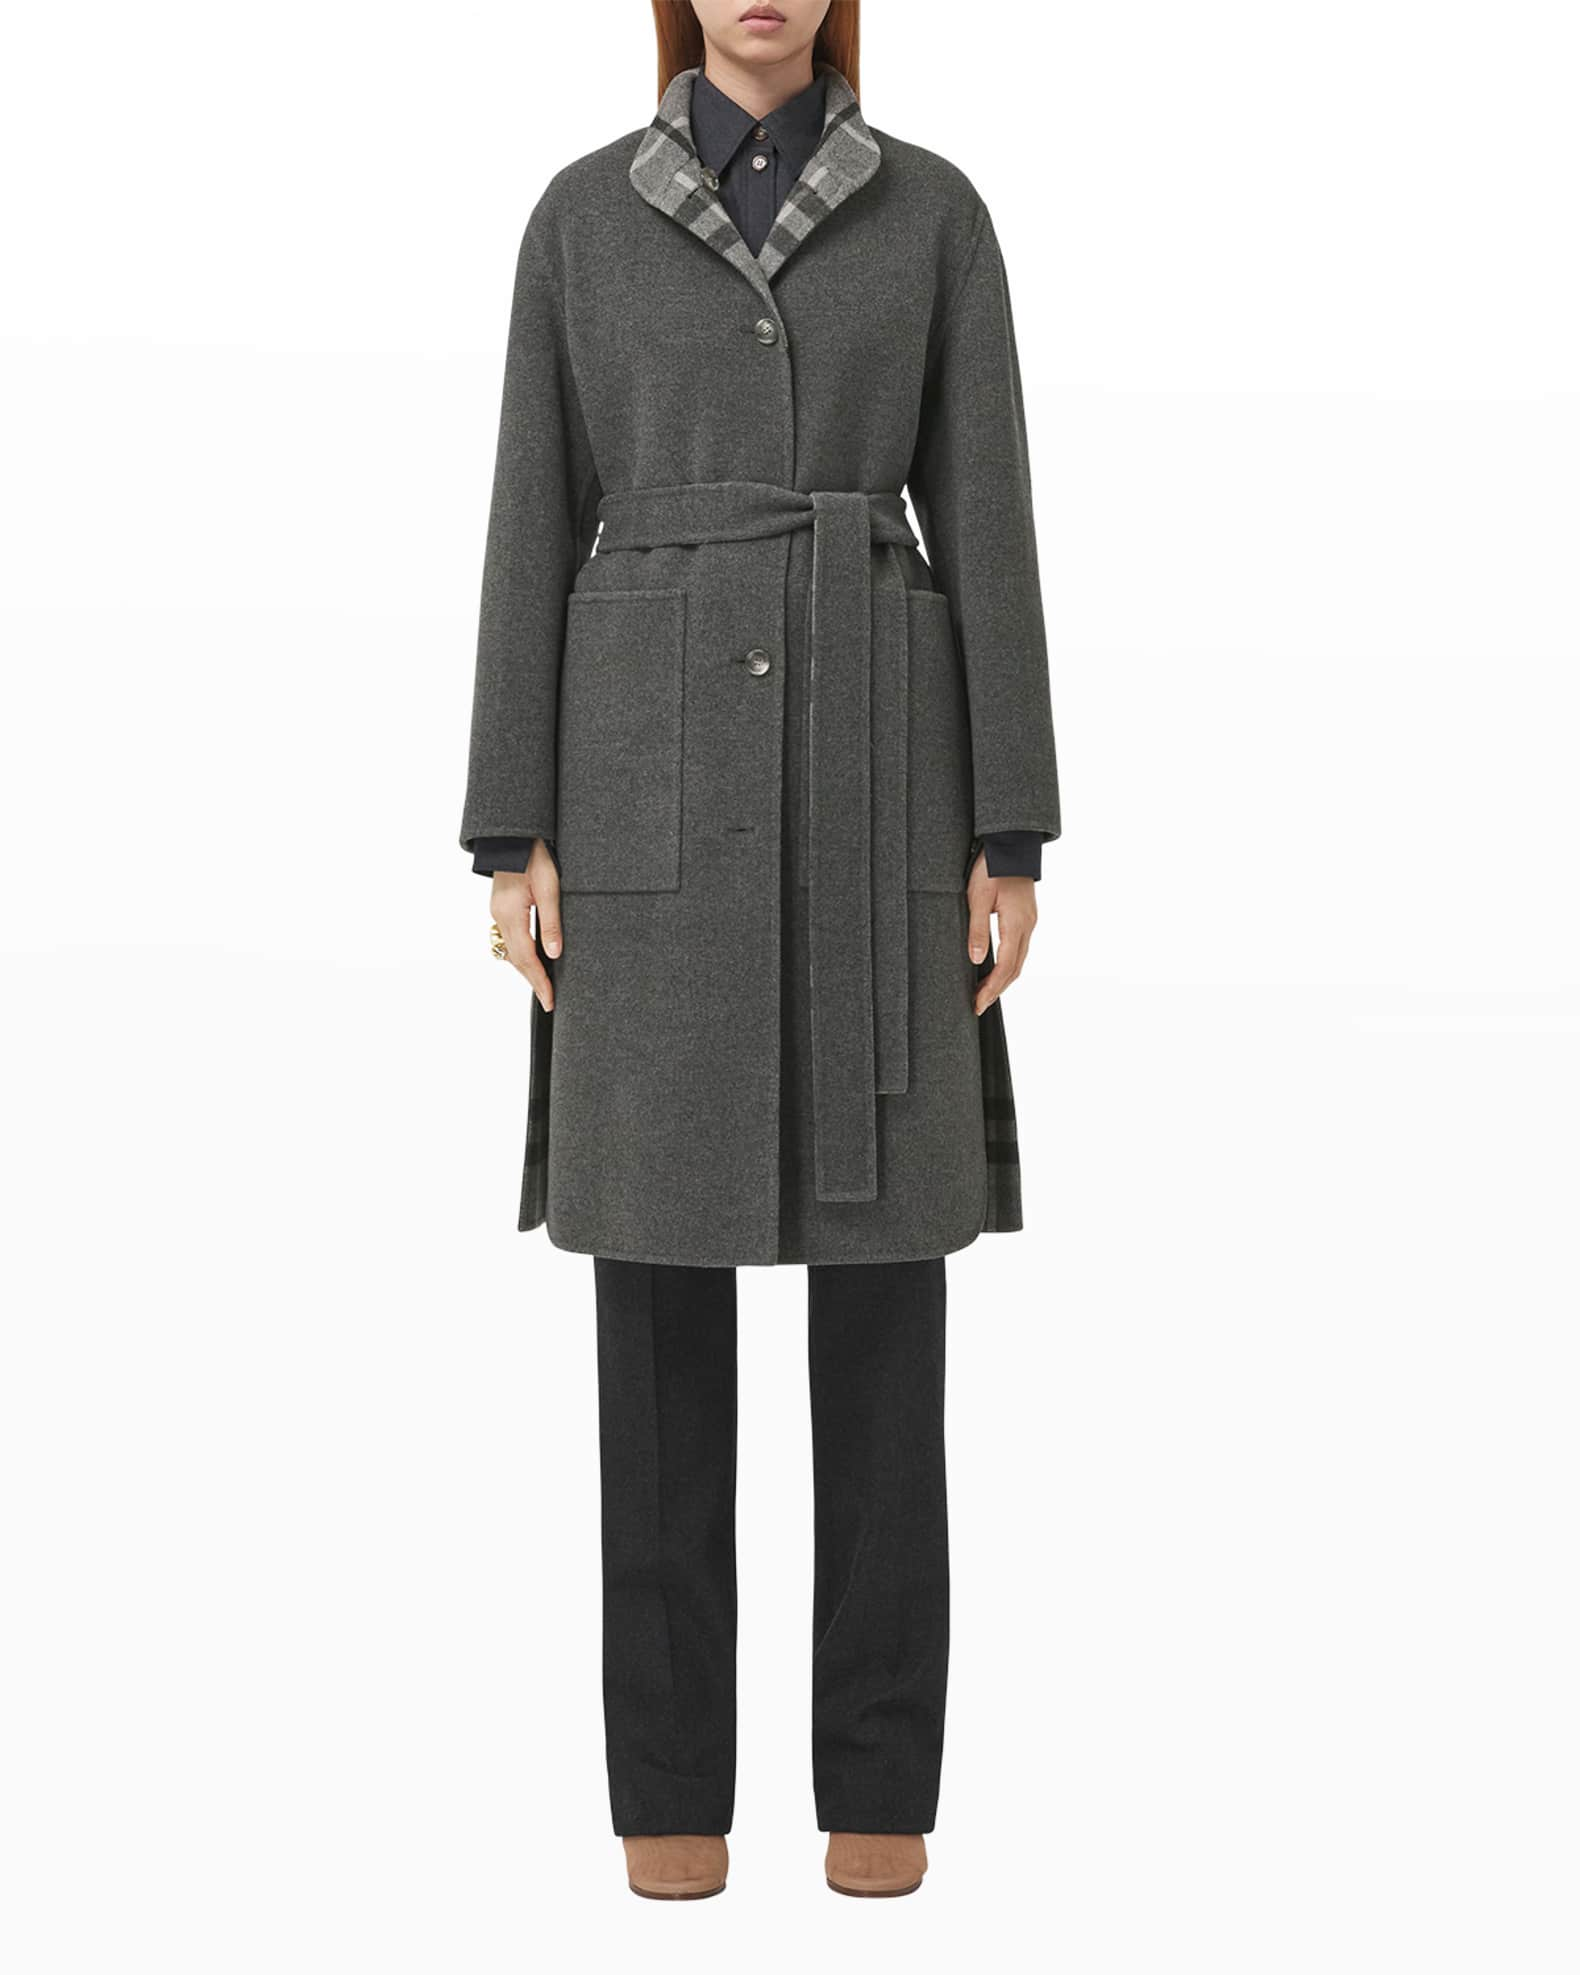 BURBERRY Vassal Reversible Check Wool Coat